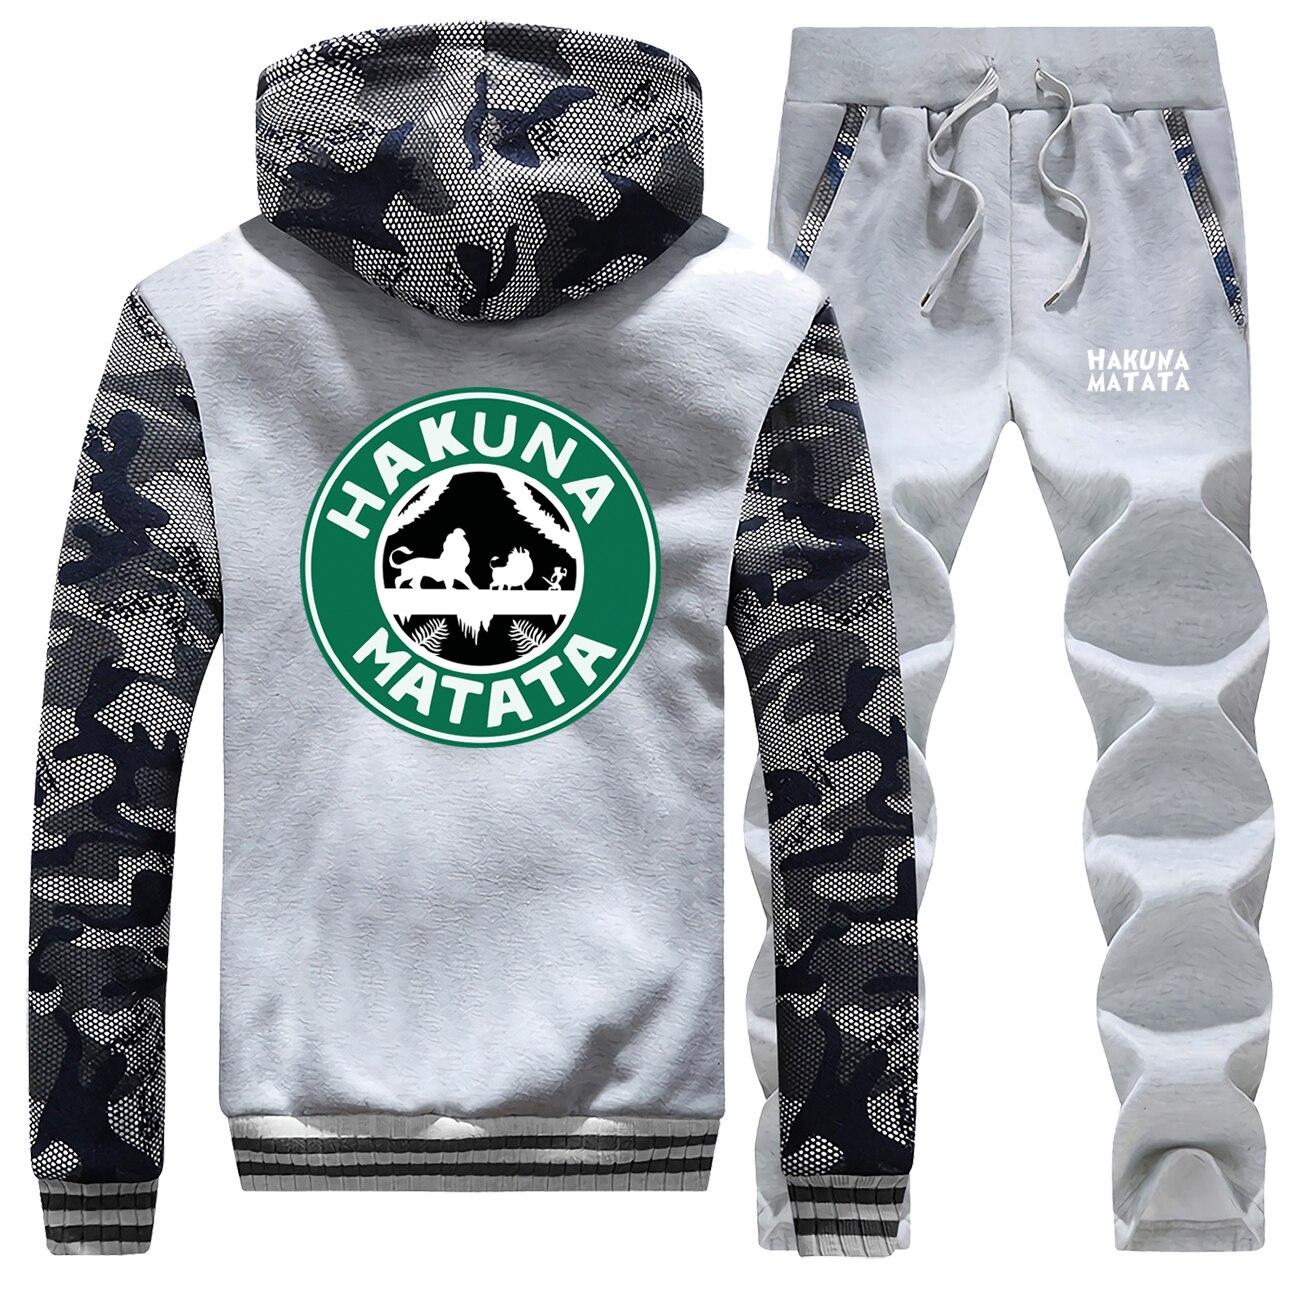 The Lion King Streetwear 2019 Winter Men Hoodie Camouflage Coat Thick Suit Cartoon HAKUNA MATATA Warm Jackets+Pants 2 Piece Set